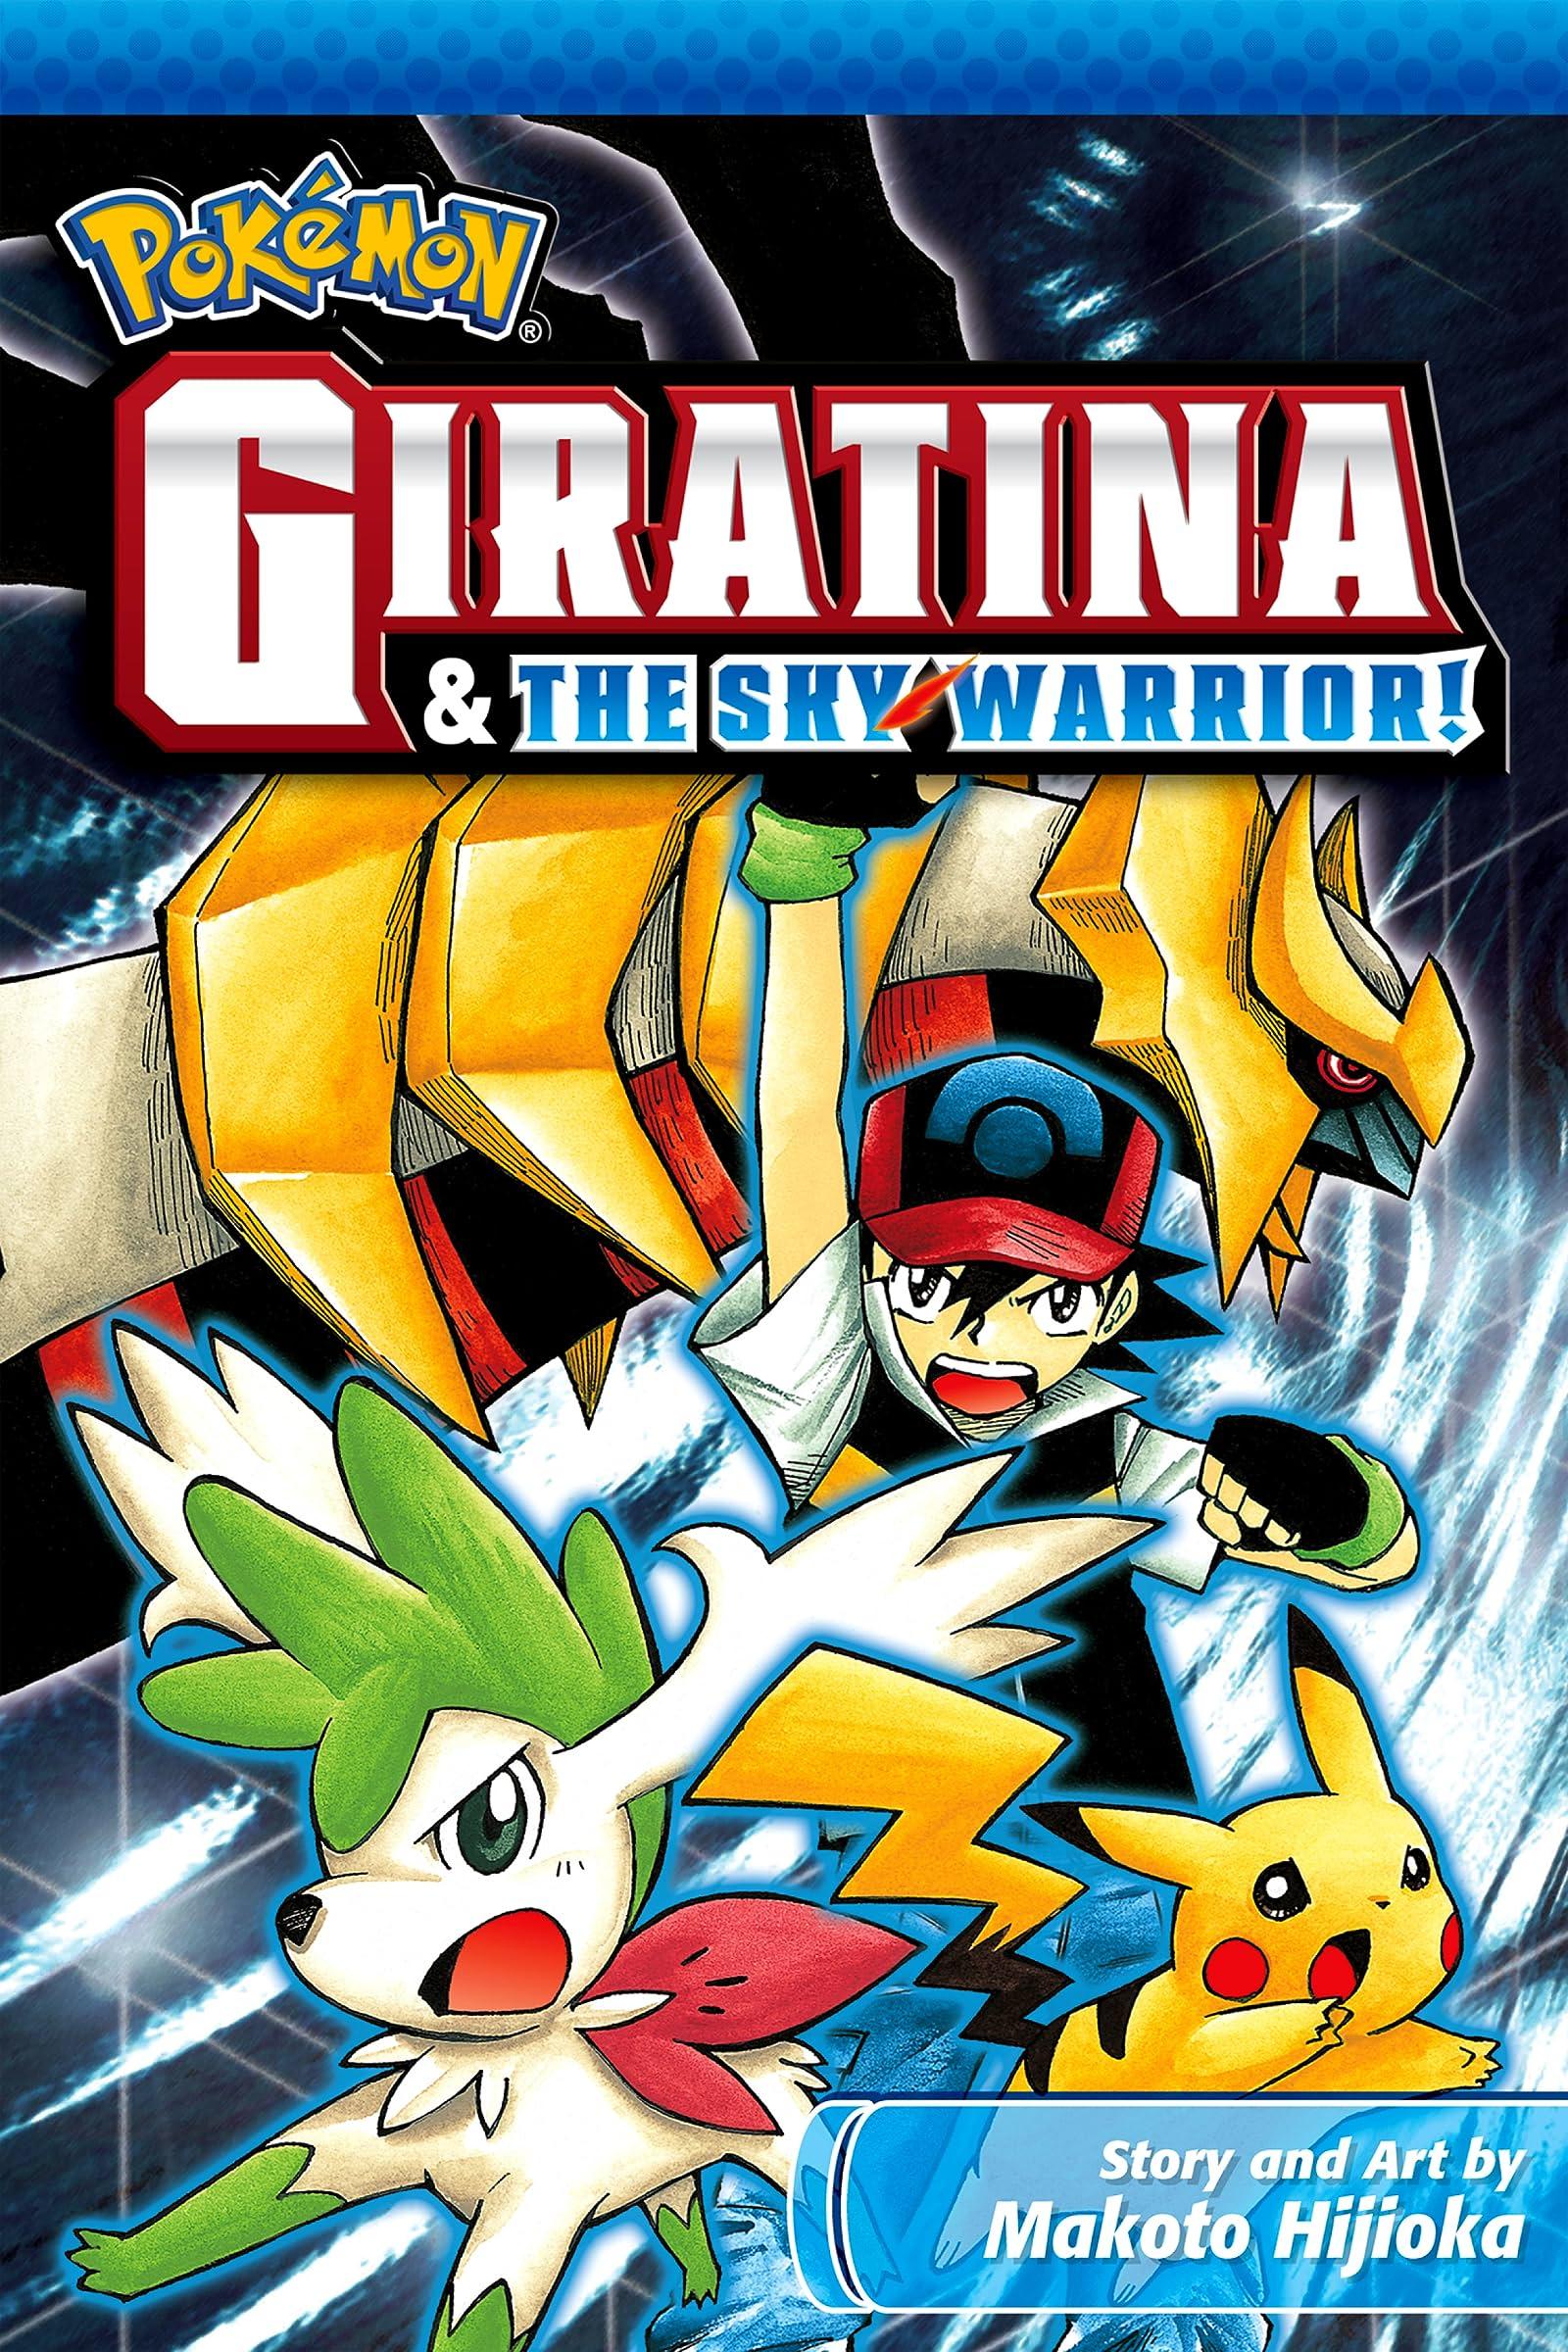 Pokemon Giratina And The Sky Warrior Vol 1 Comics By Comixology